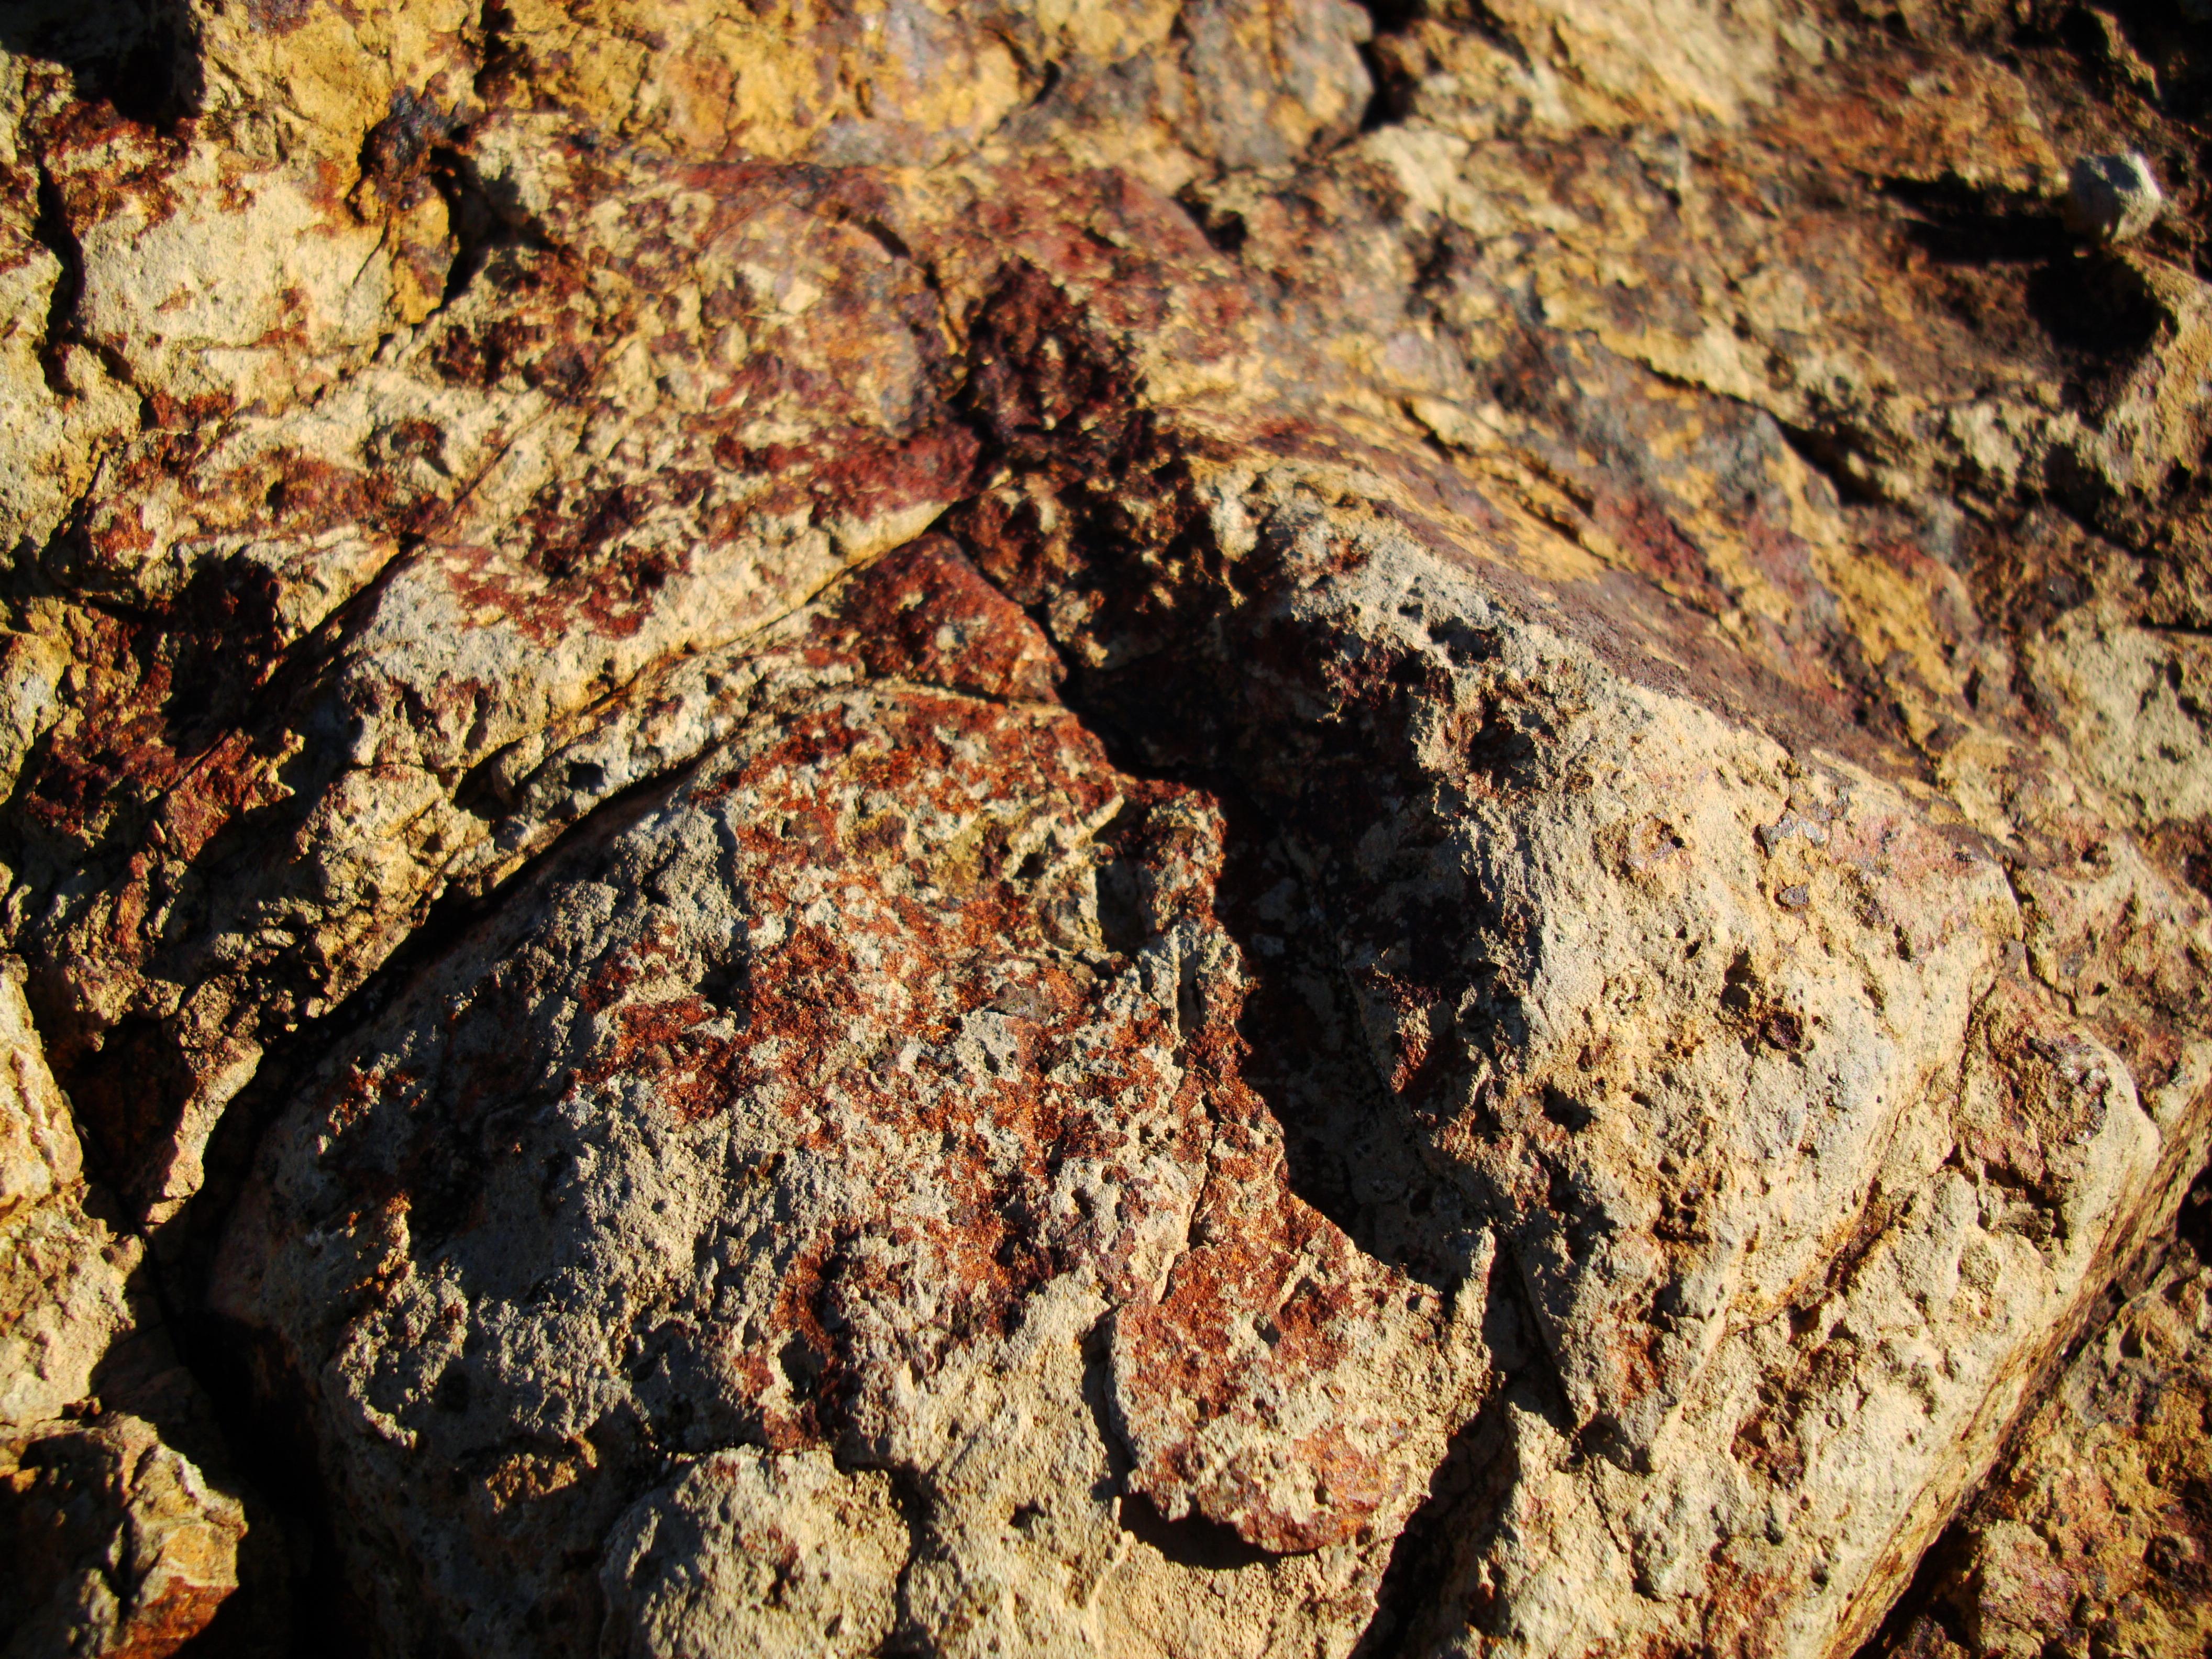 Textures Rocks Stones Pebbles Noosa National Park 10